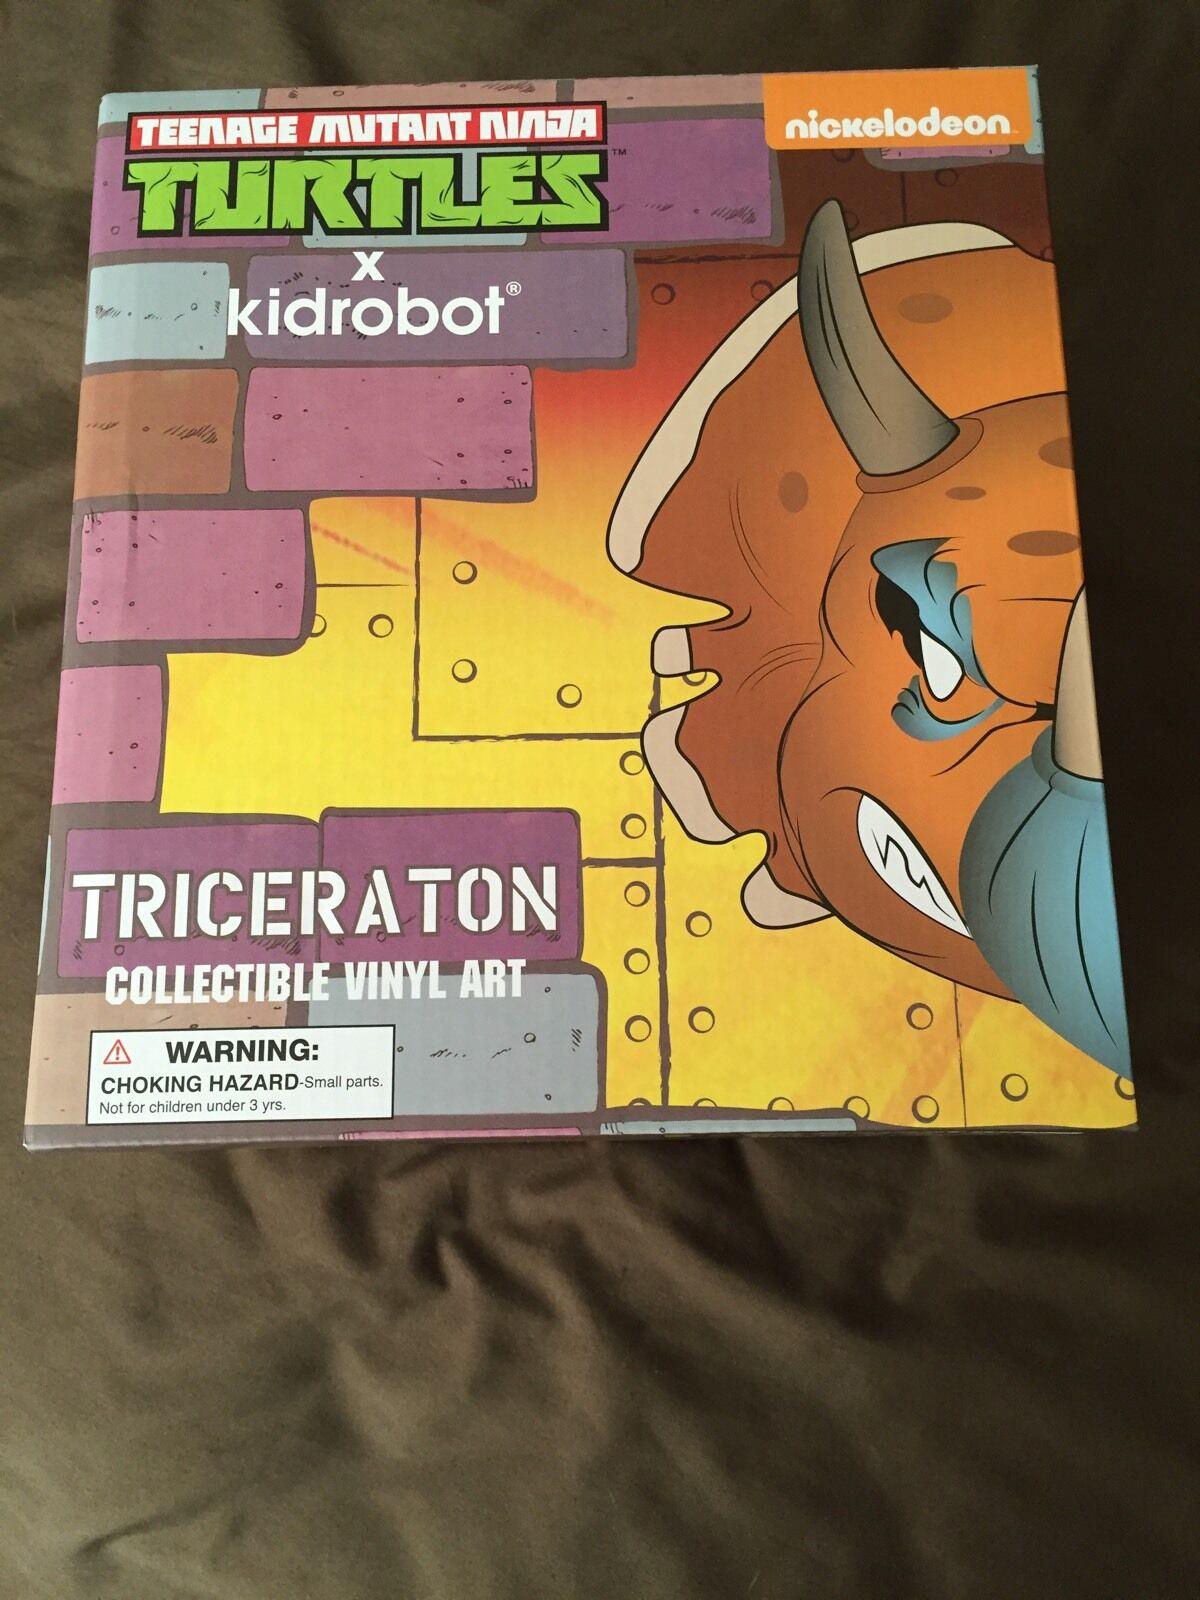 TRICERATON COLLECTIBLE VINYL ART TMNT SDCC 2016 EXCLUSIVE KIDROBOT